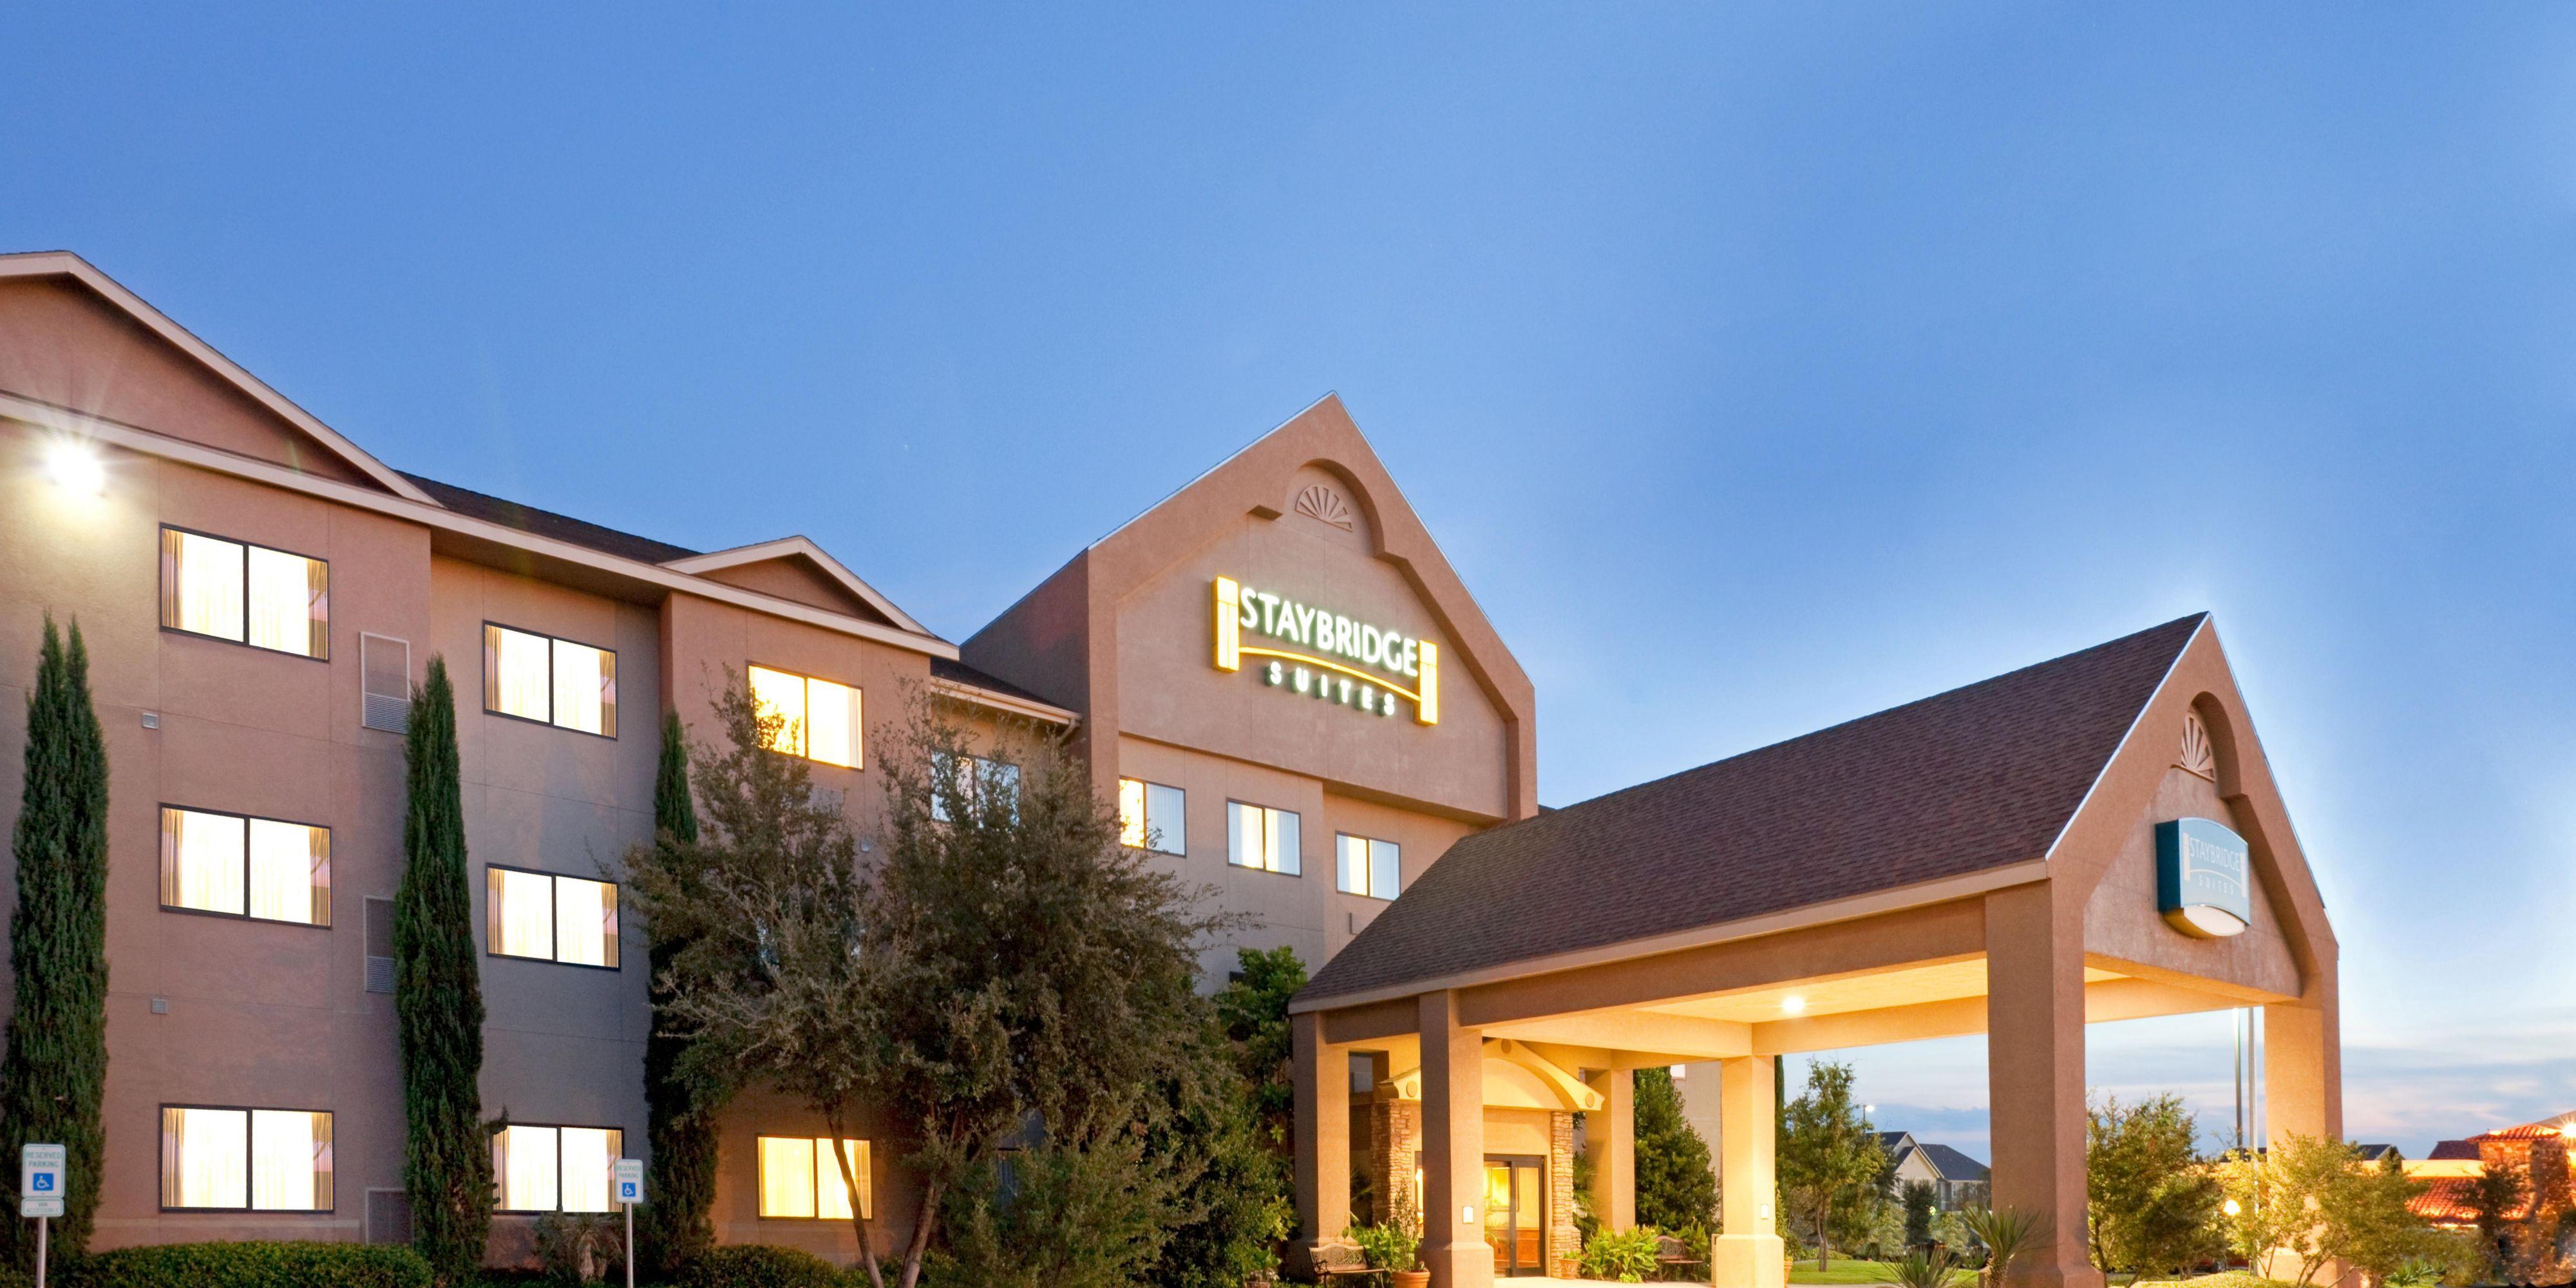 Staybridge Suites San Angelo image 0